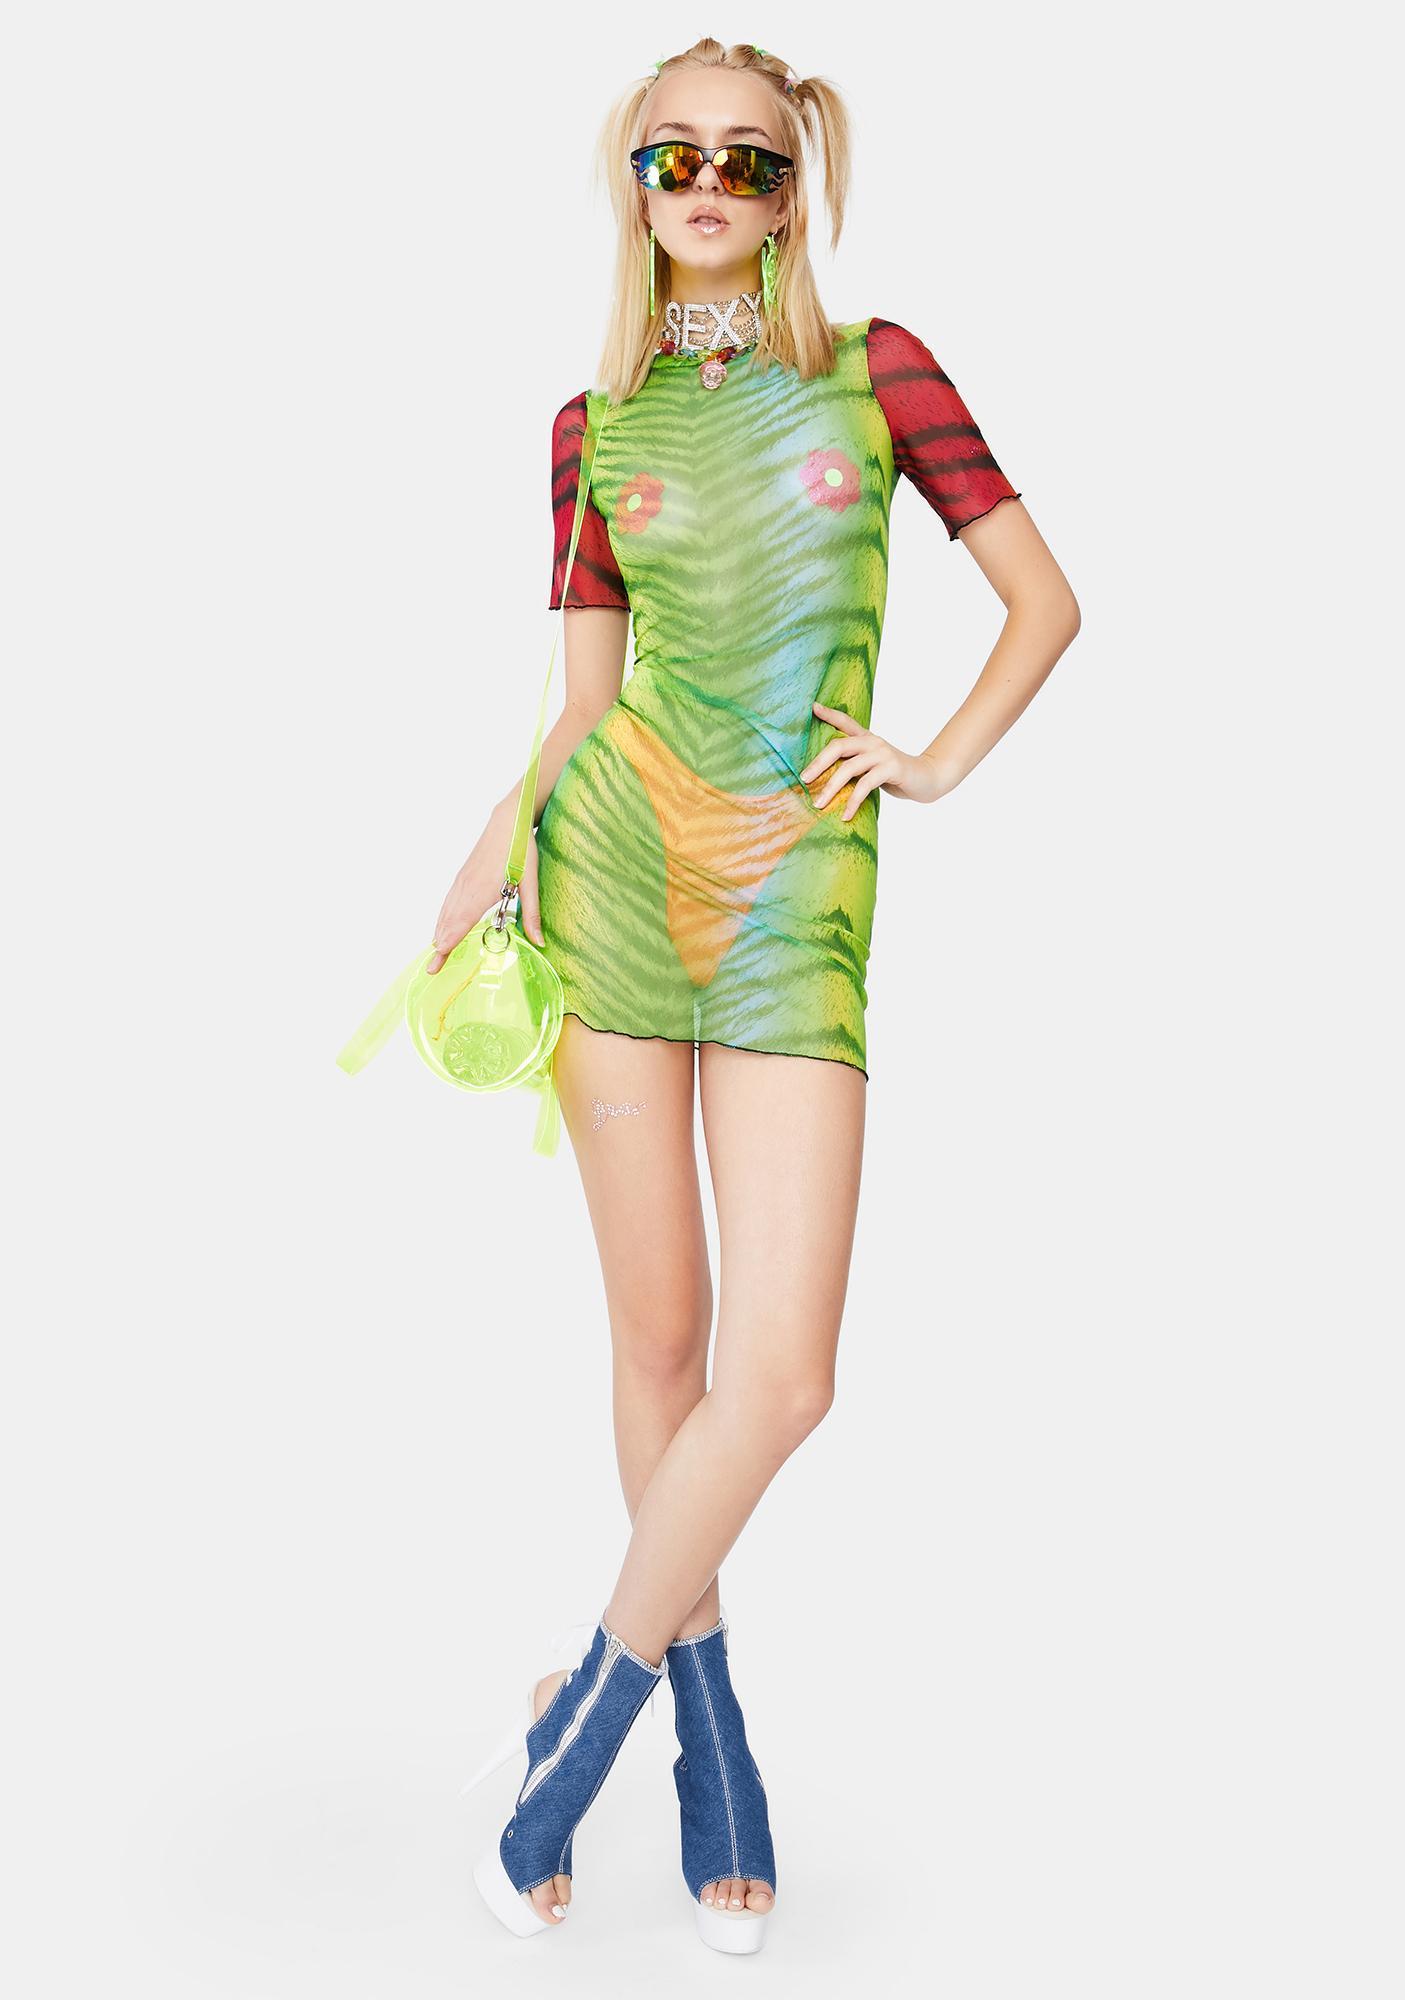 Ivy Berlin Feral Tiger Dress